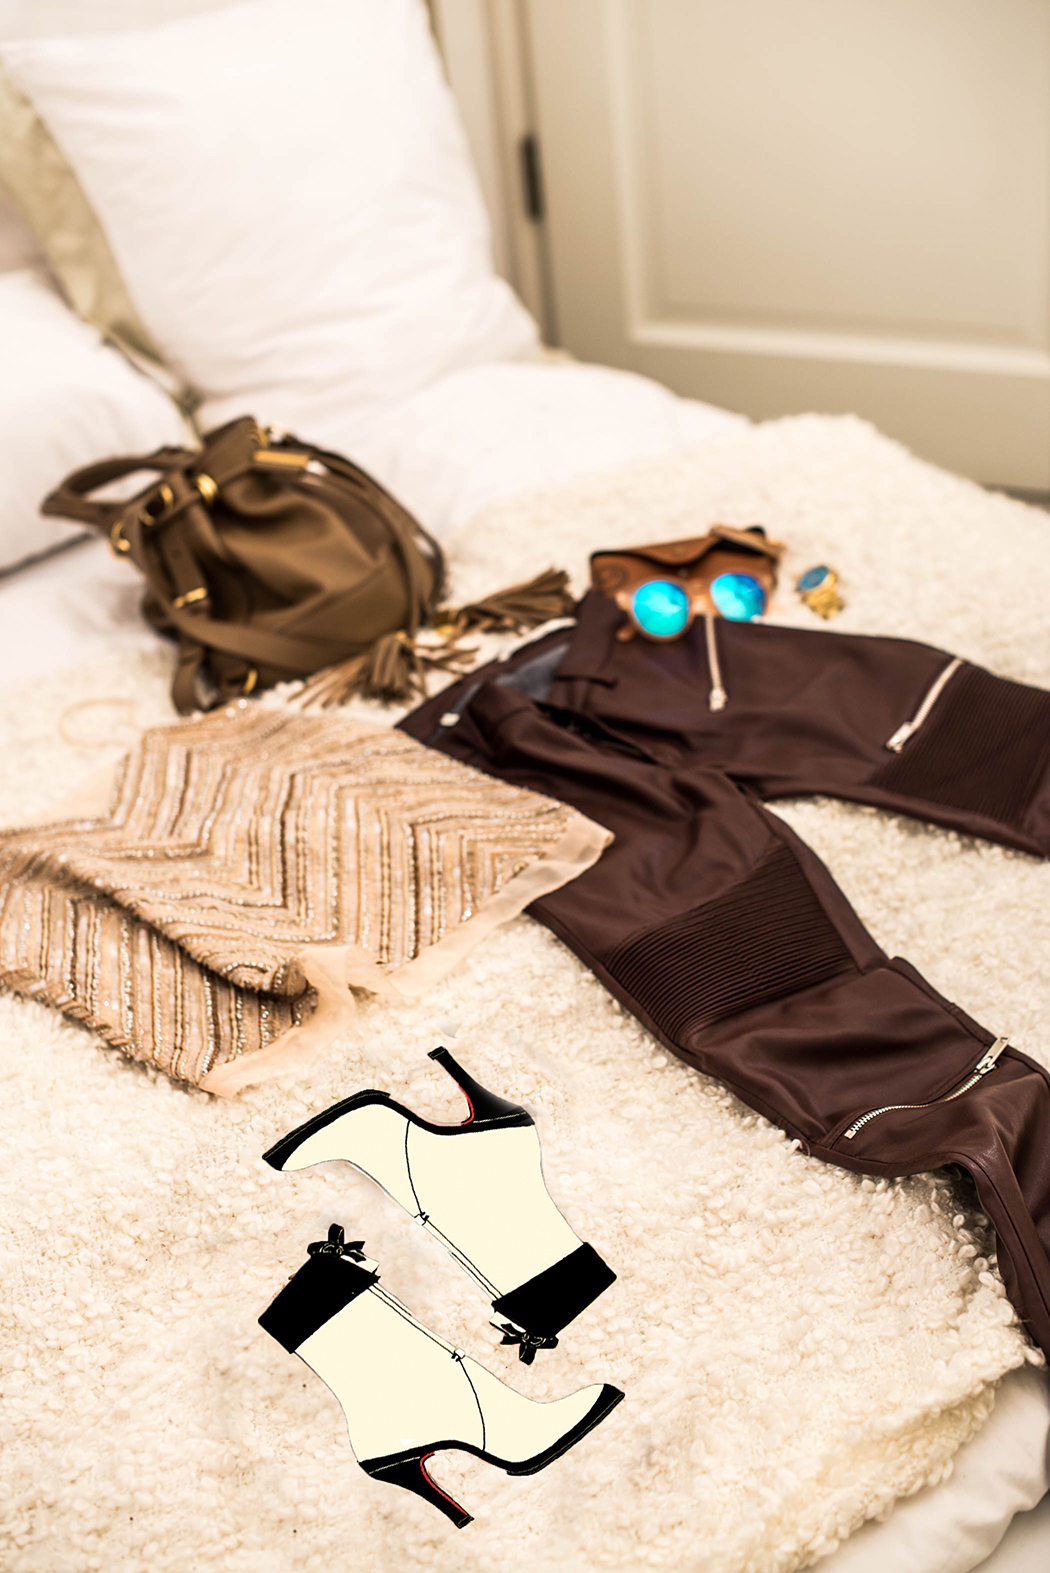 Ootd-Silvesteroutfit-Fashionblogger-München-Lindarella-3